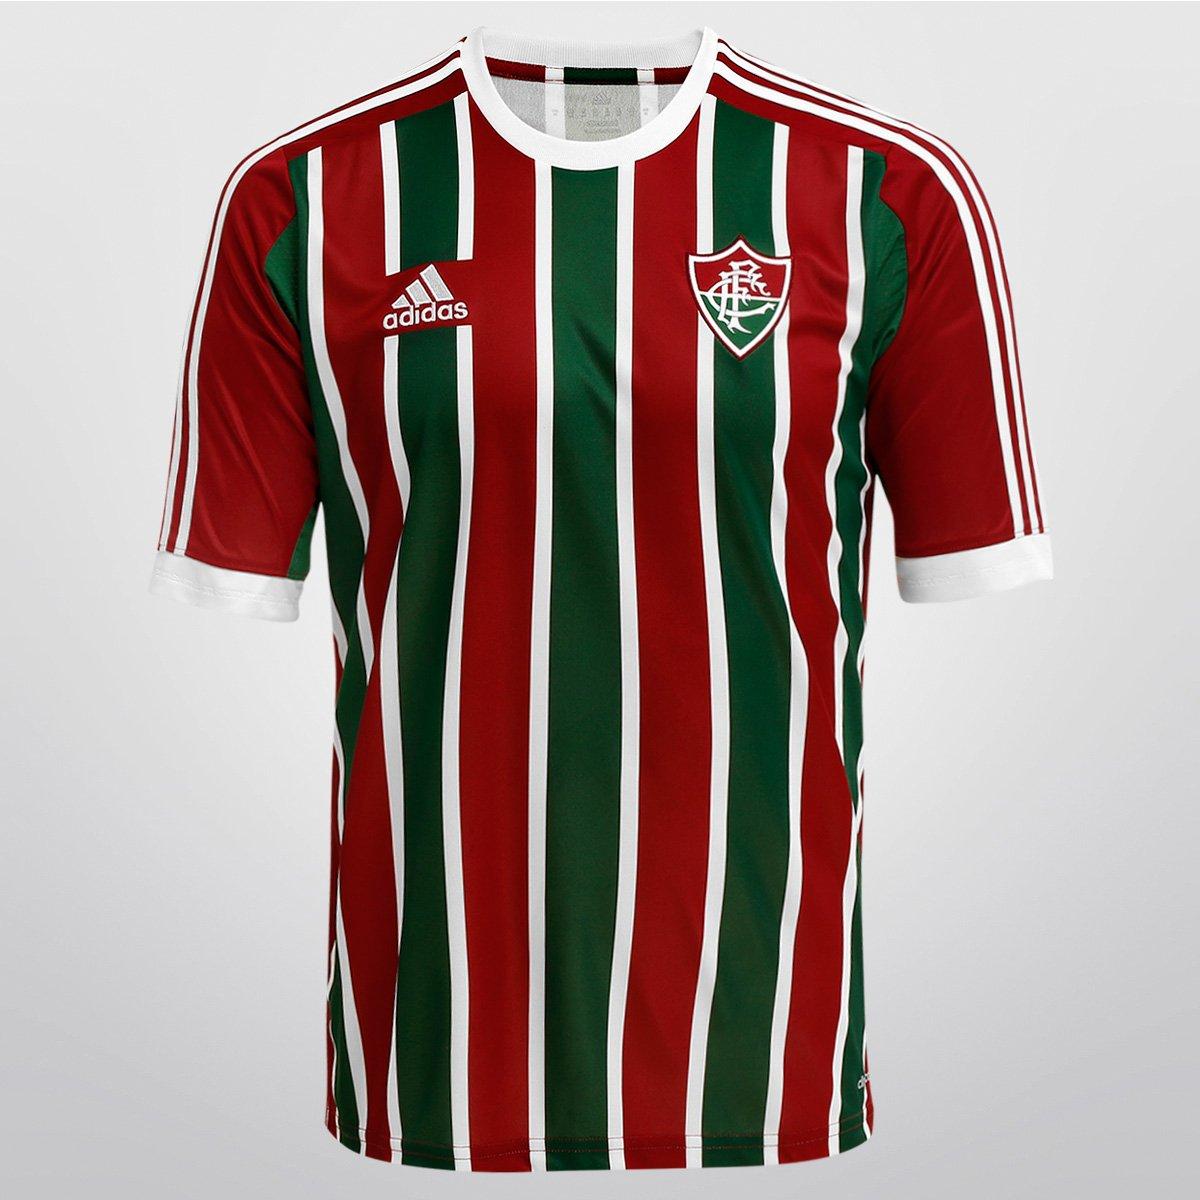 Camisa Adidas Fluminense I 2015 s nº - Compre Agora  cbc781ec35cfa